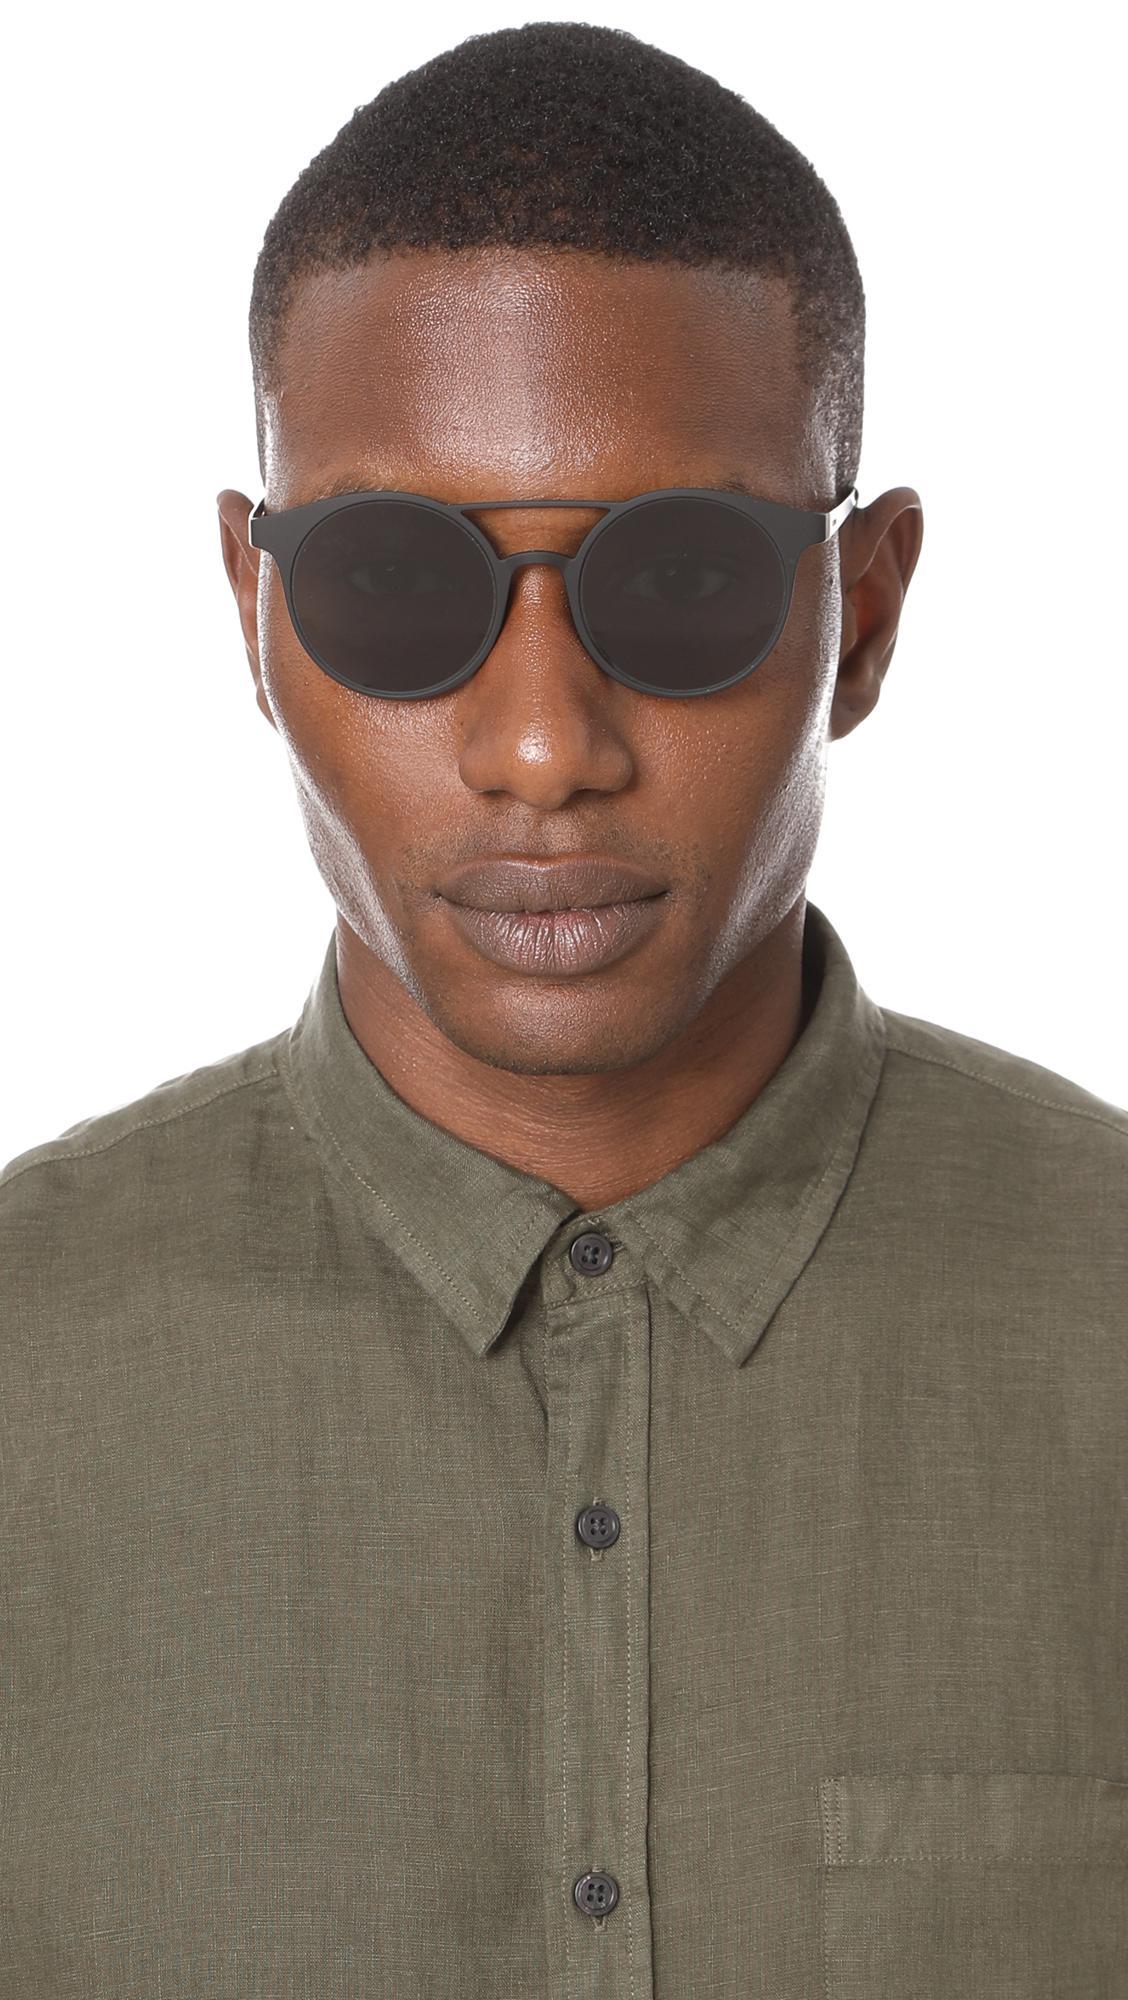 5772c61b86b Le Specs - Black Demo Mode Sunglasses for Men - Lyst. View fullscreen